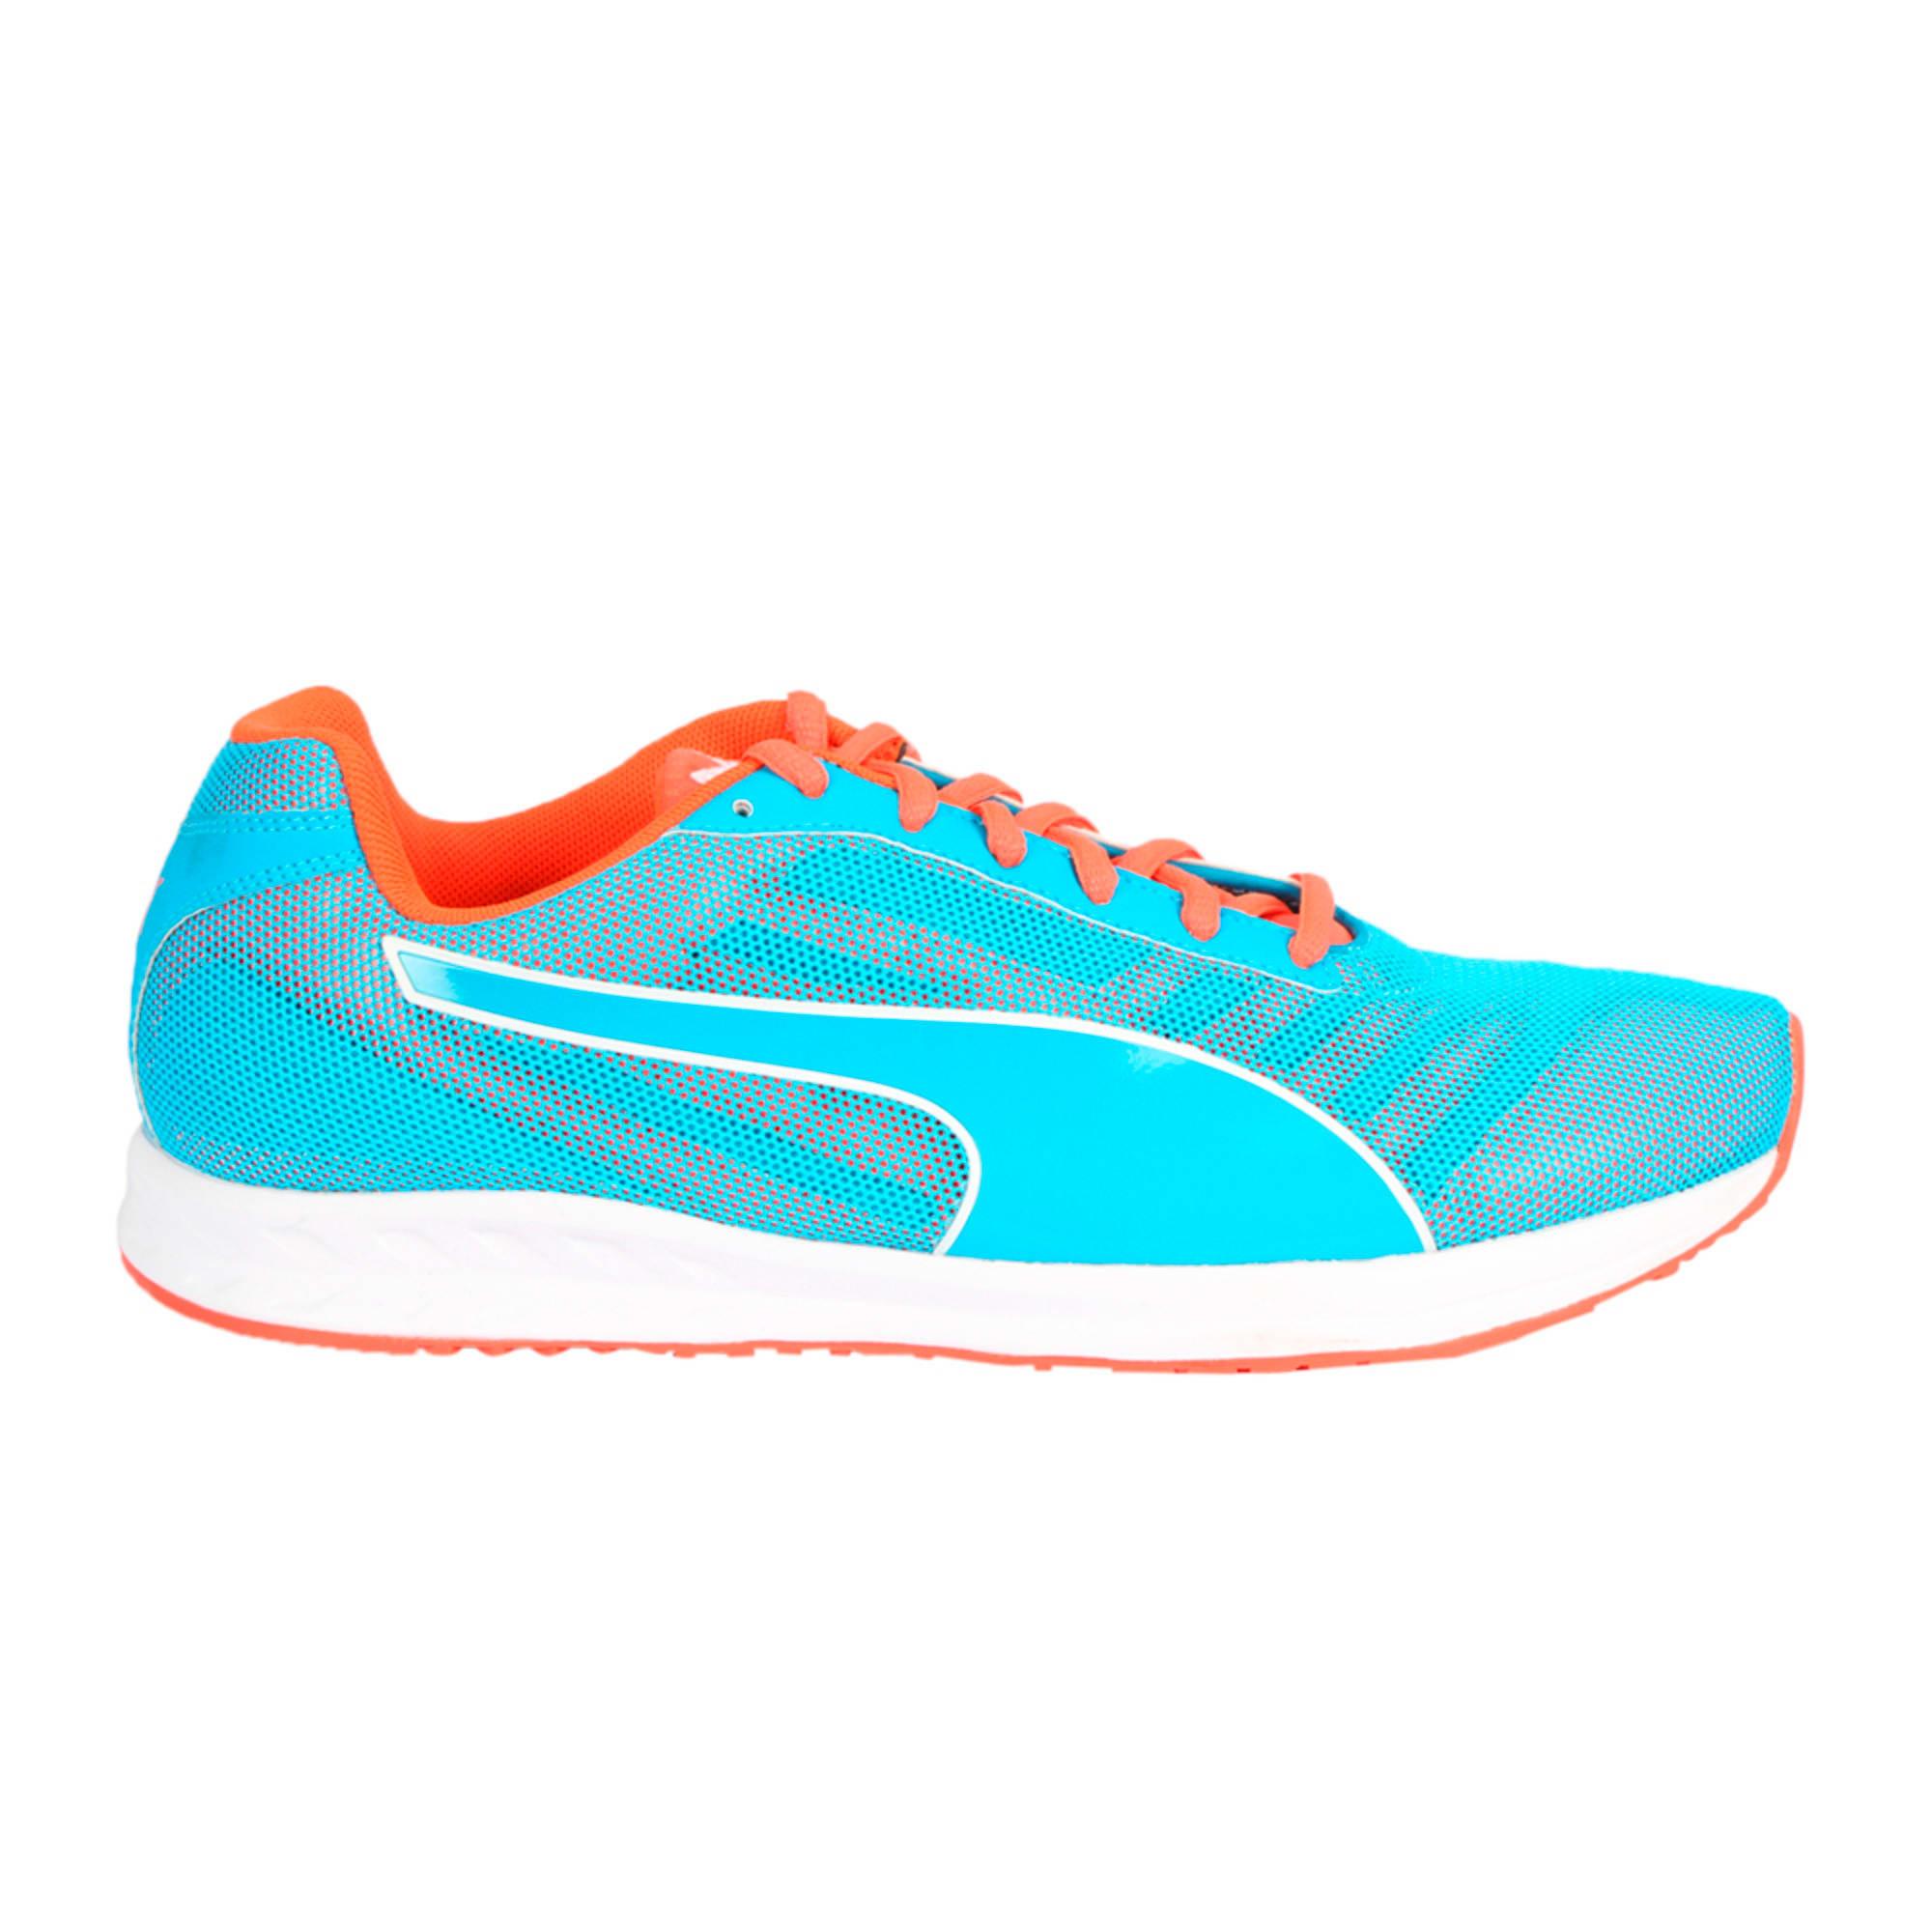 Thumbnail 5 of Burst Running Shoes, atomic blue-red blast, medium-IND